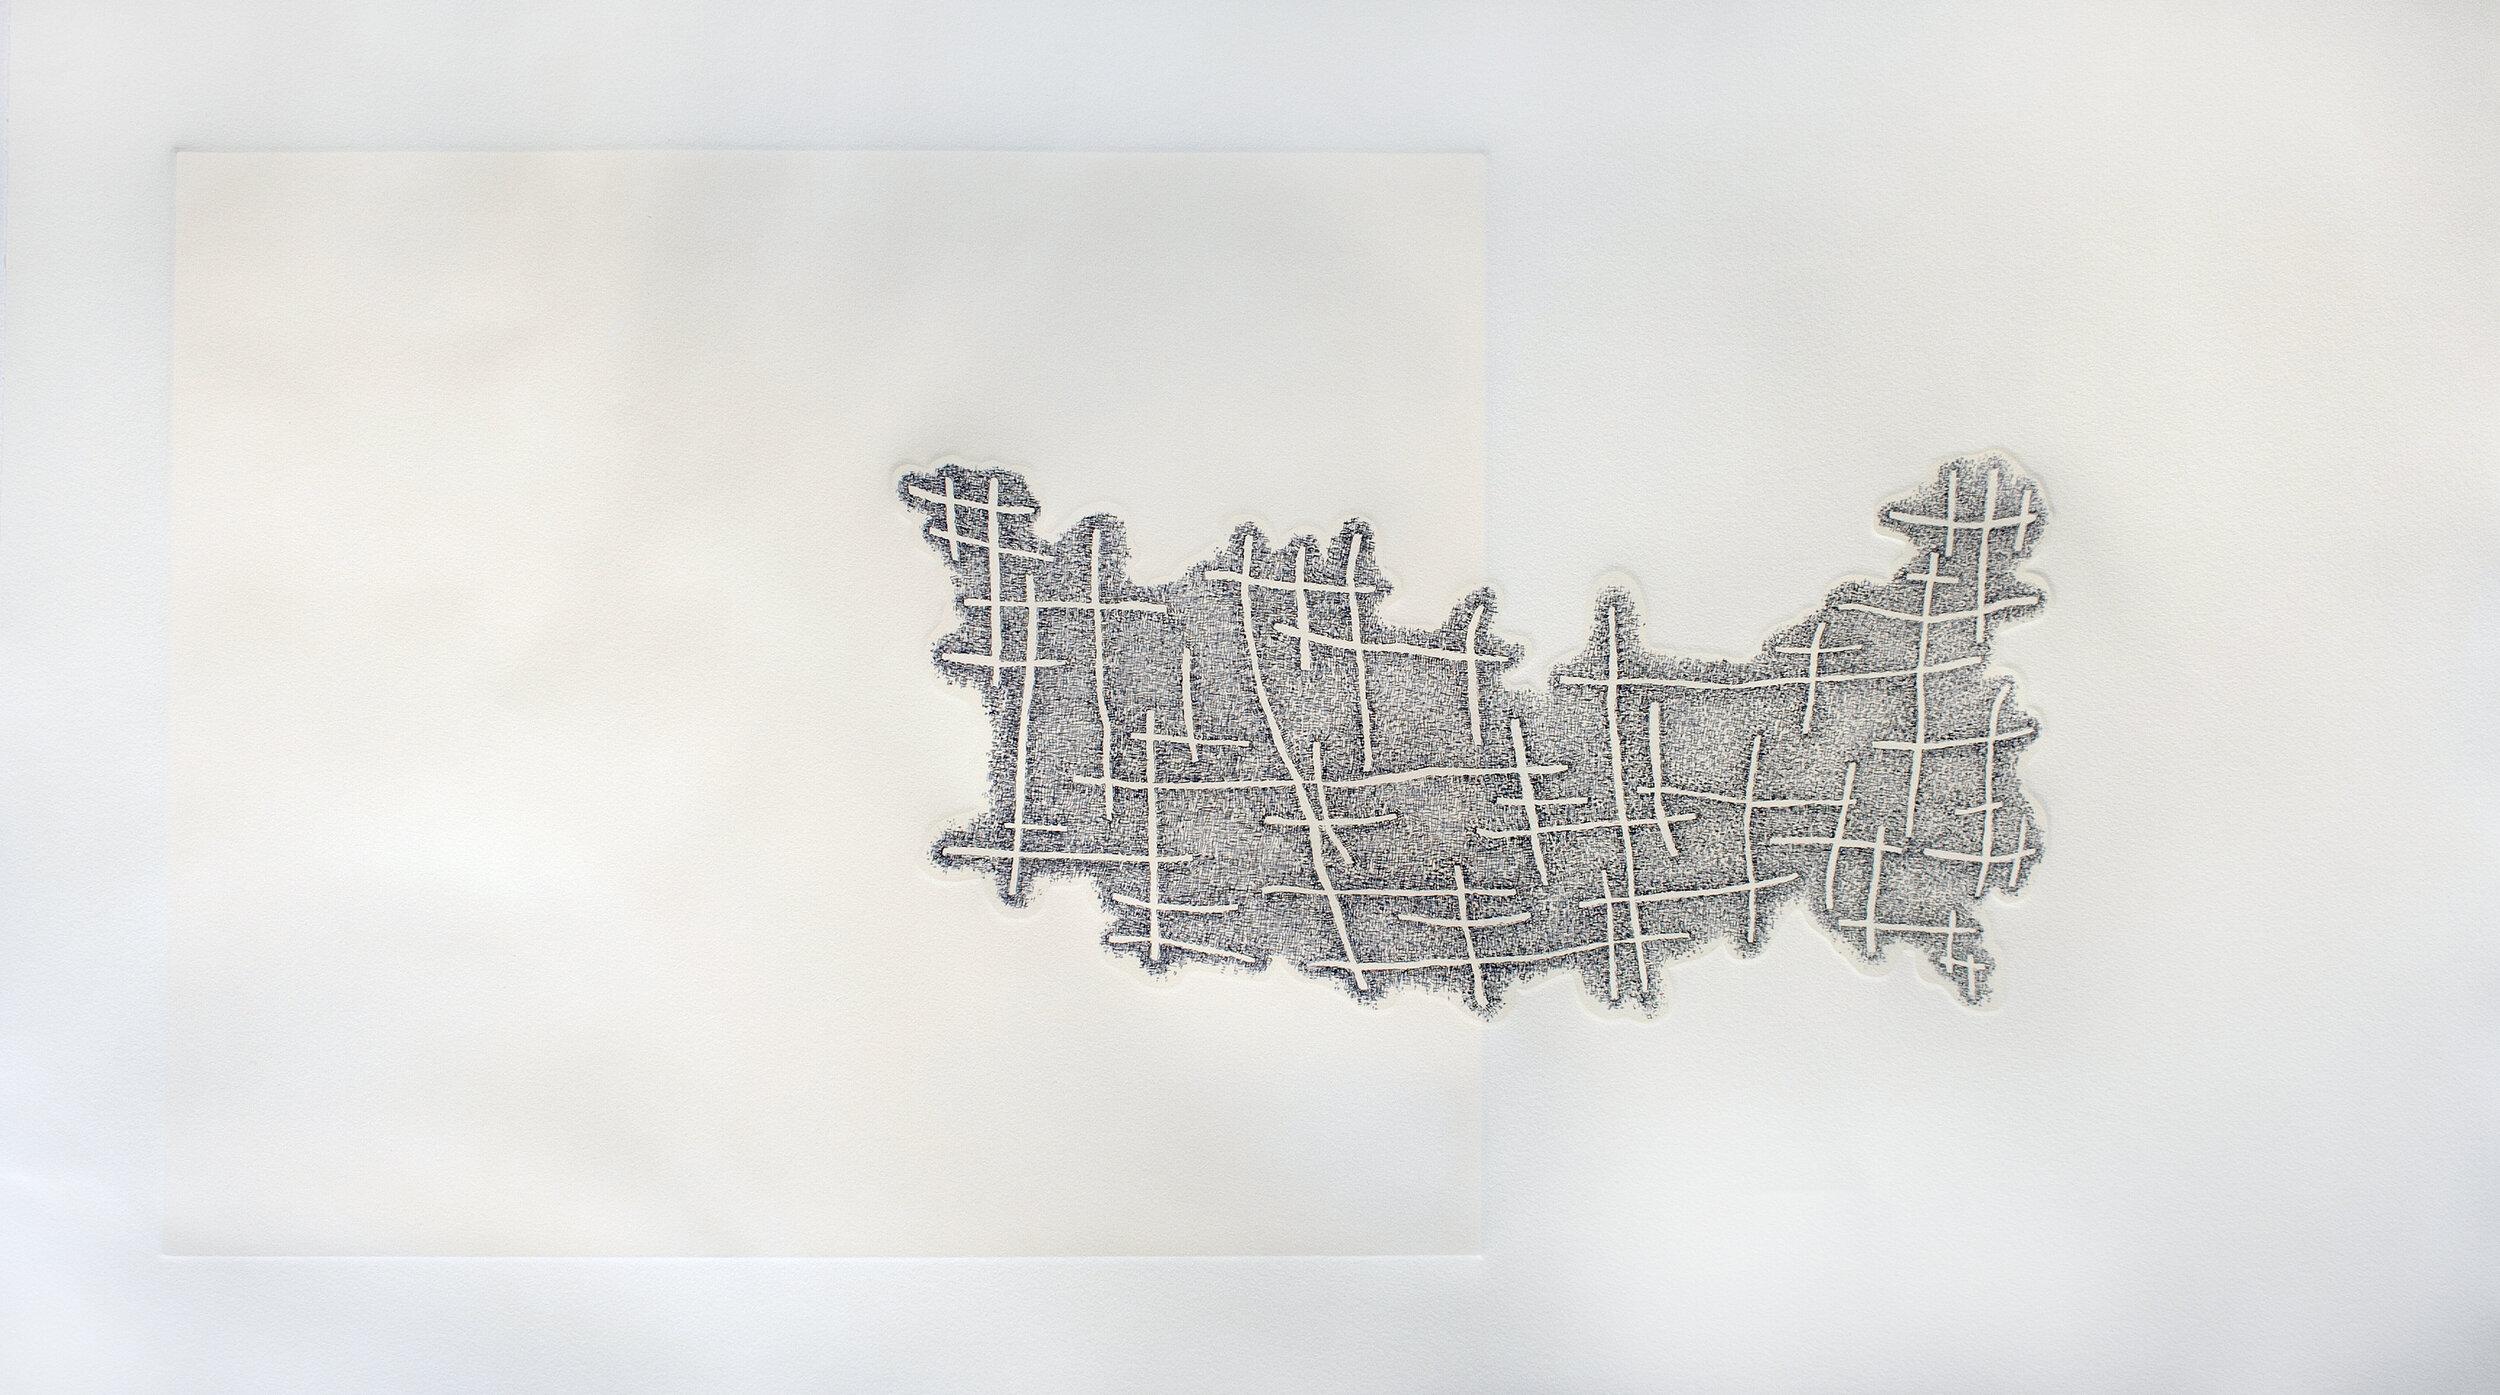 Siena_James_Displaced_Non_Map.jpg